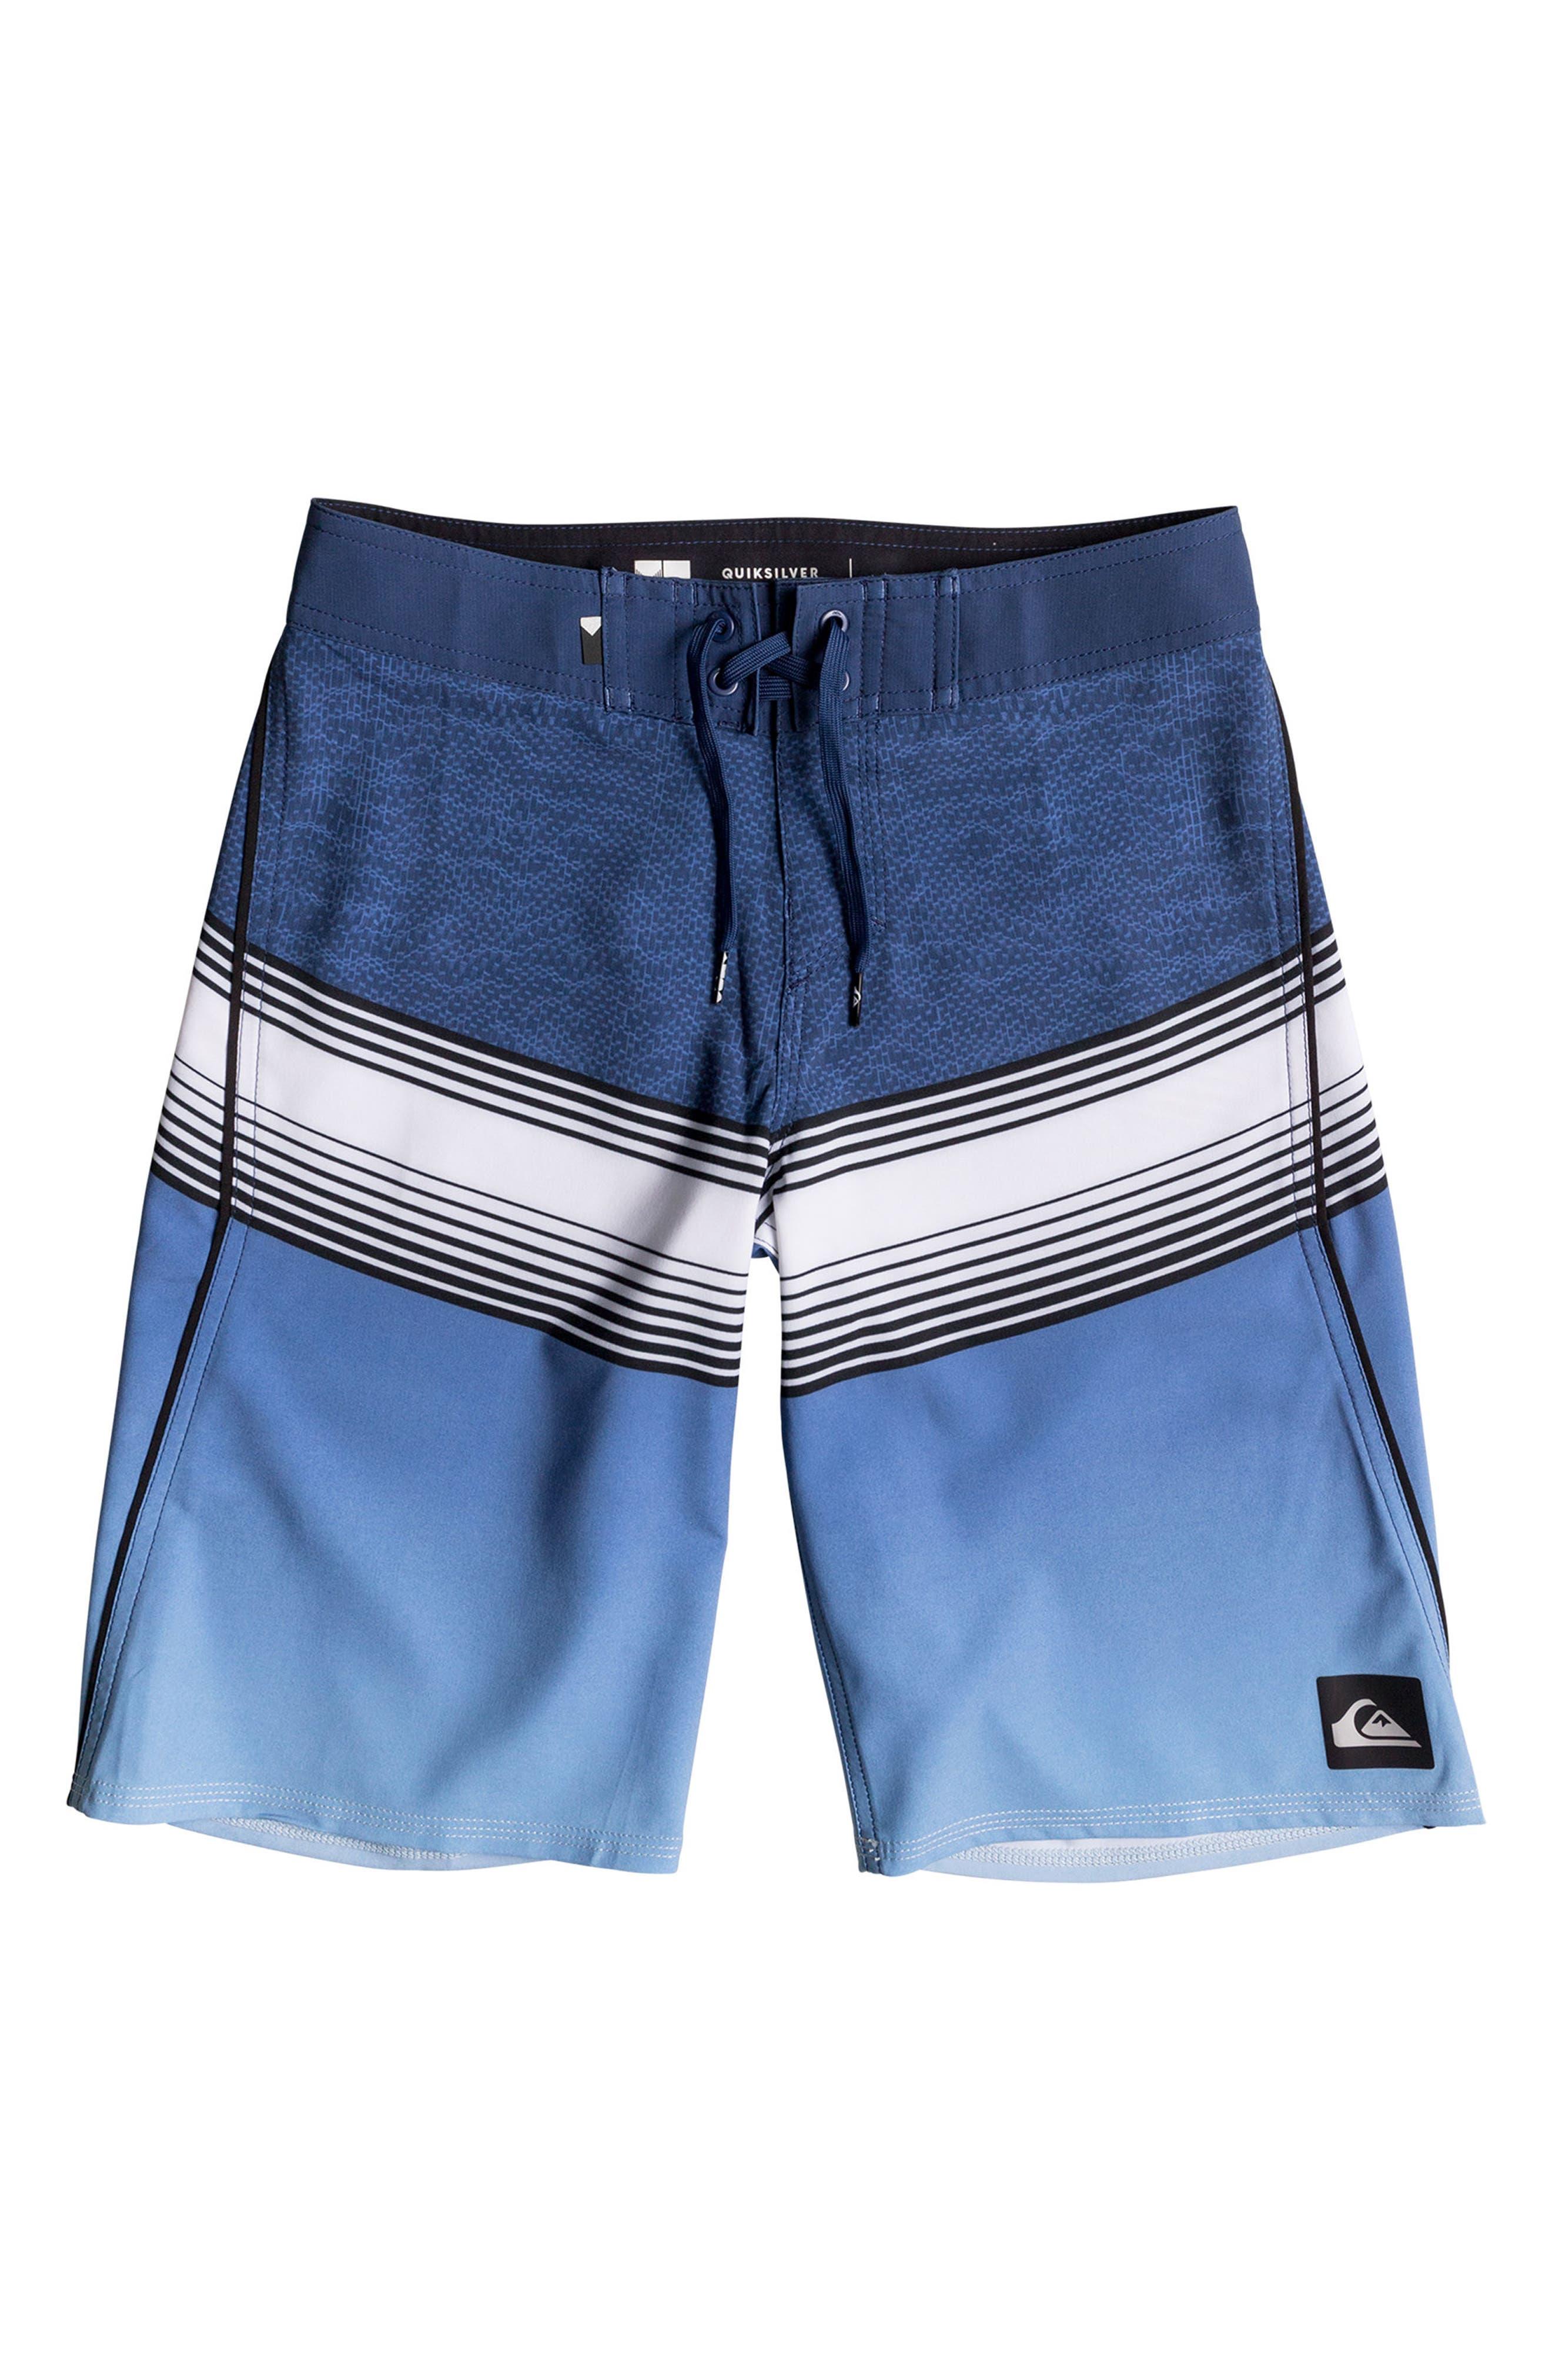 Alternate Image 1 Selected - Quiksilver Division Fade Board Shorts (Big Boys)